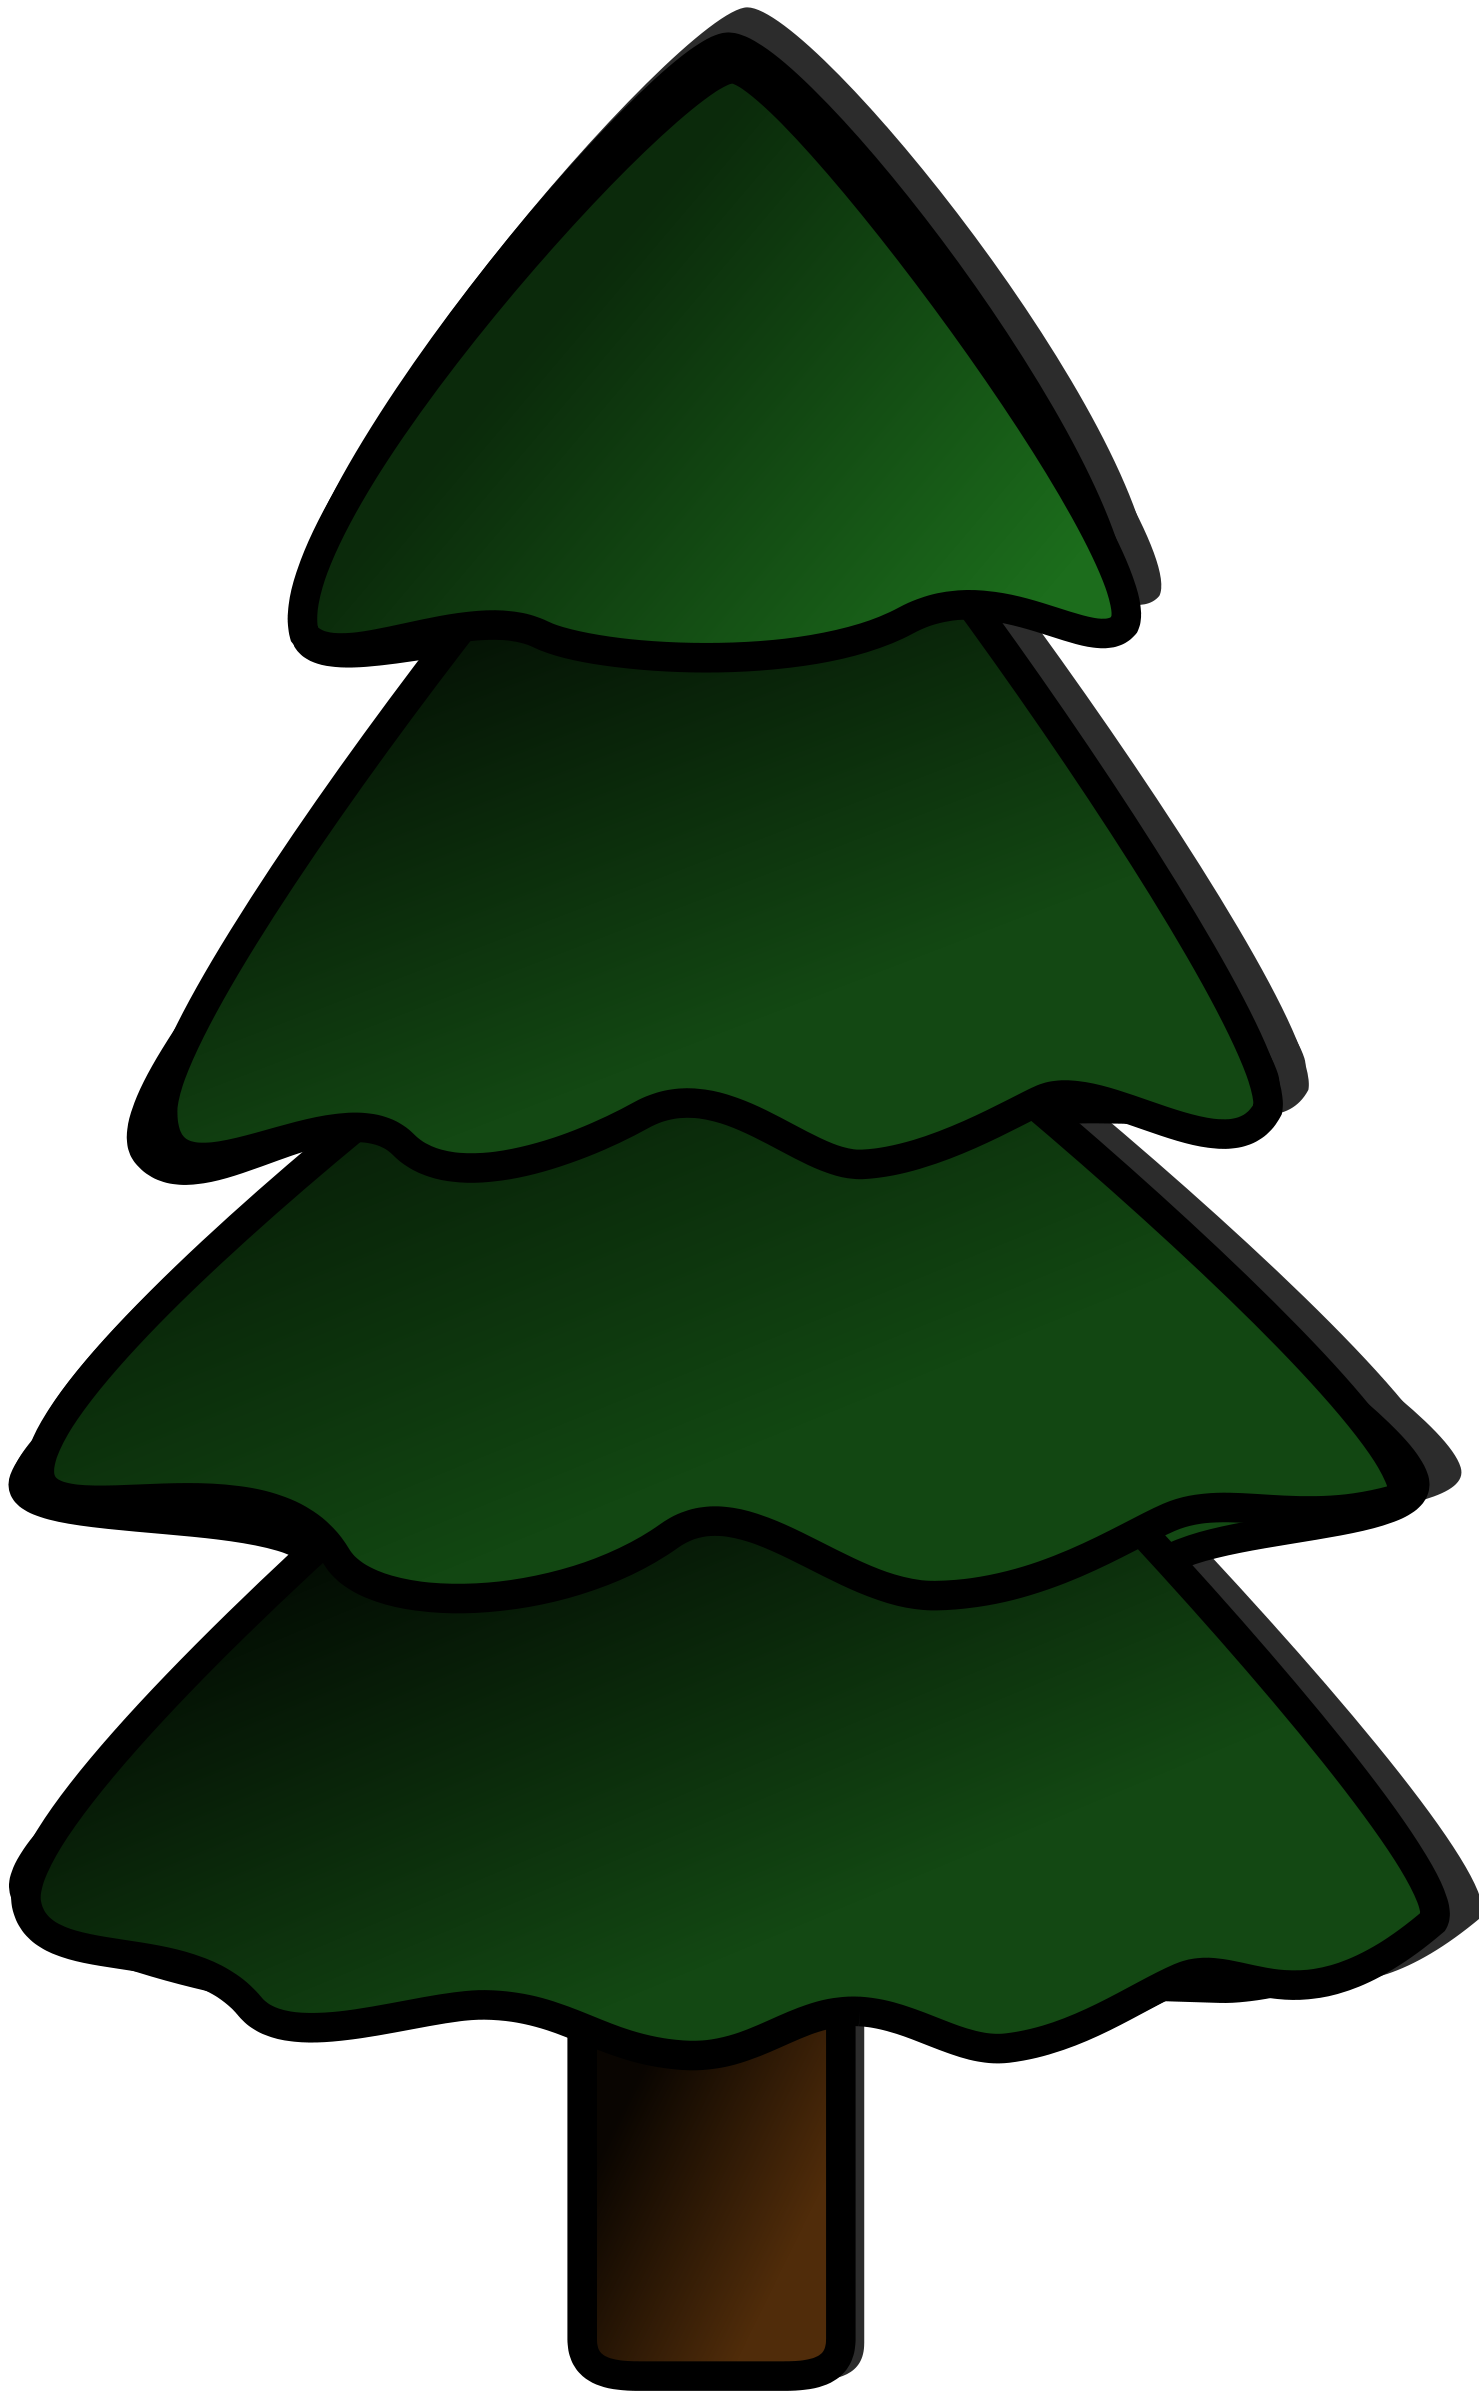 pine tree clipart - Clip Art Pine Tree